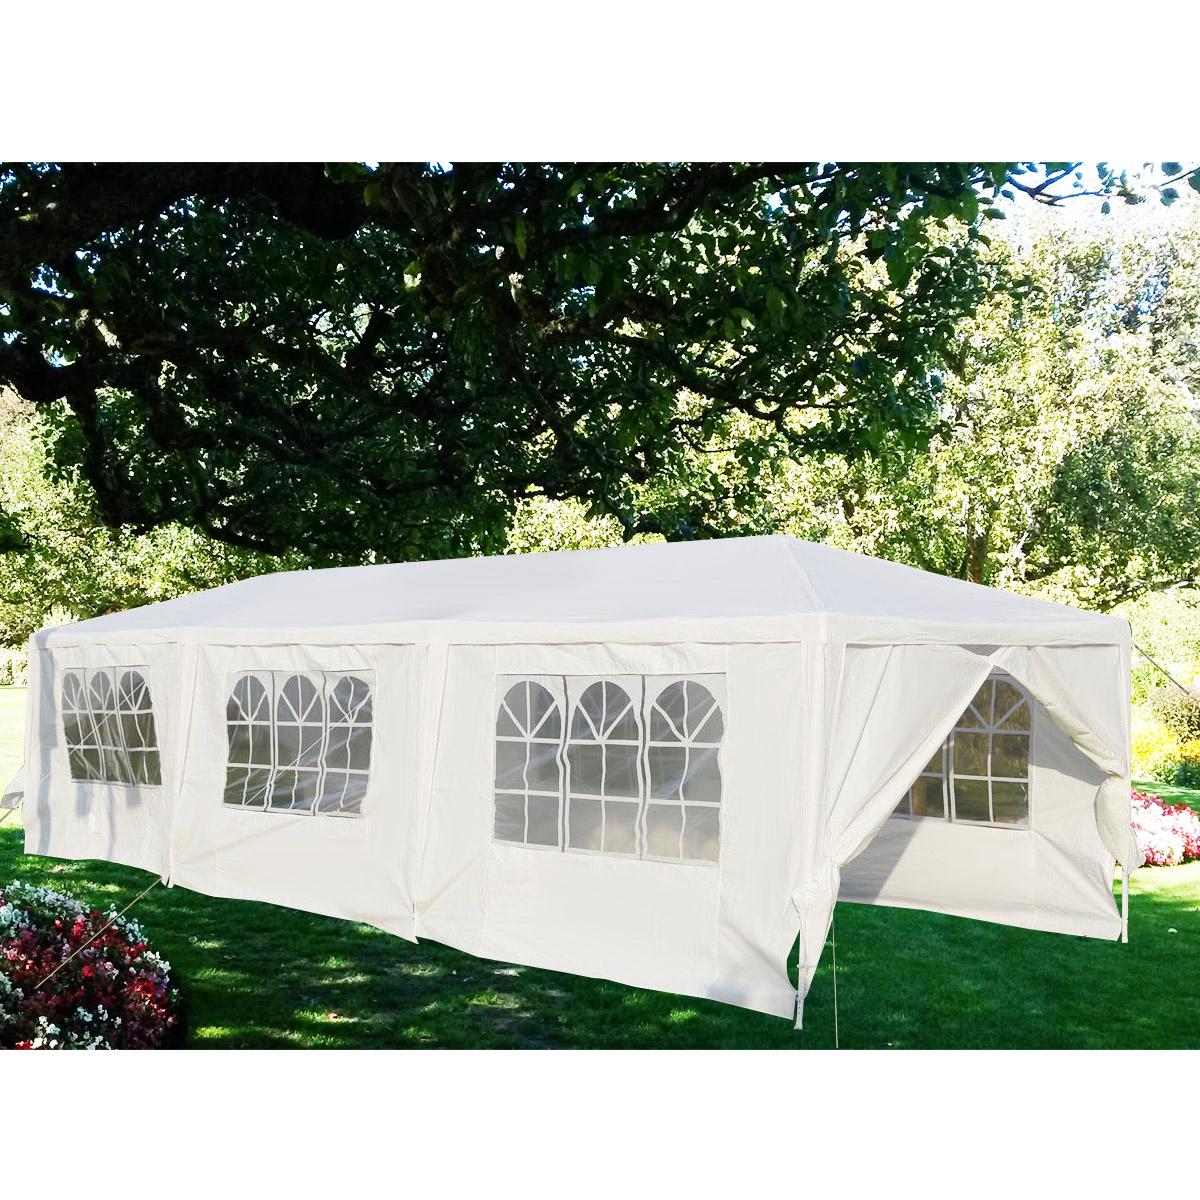 1030ft pvc fabric aluminum frame wedding event tent